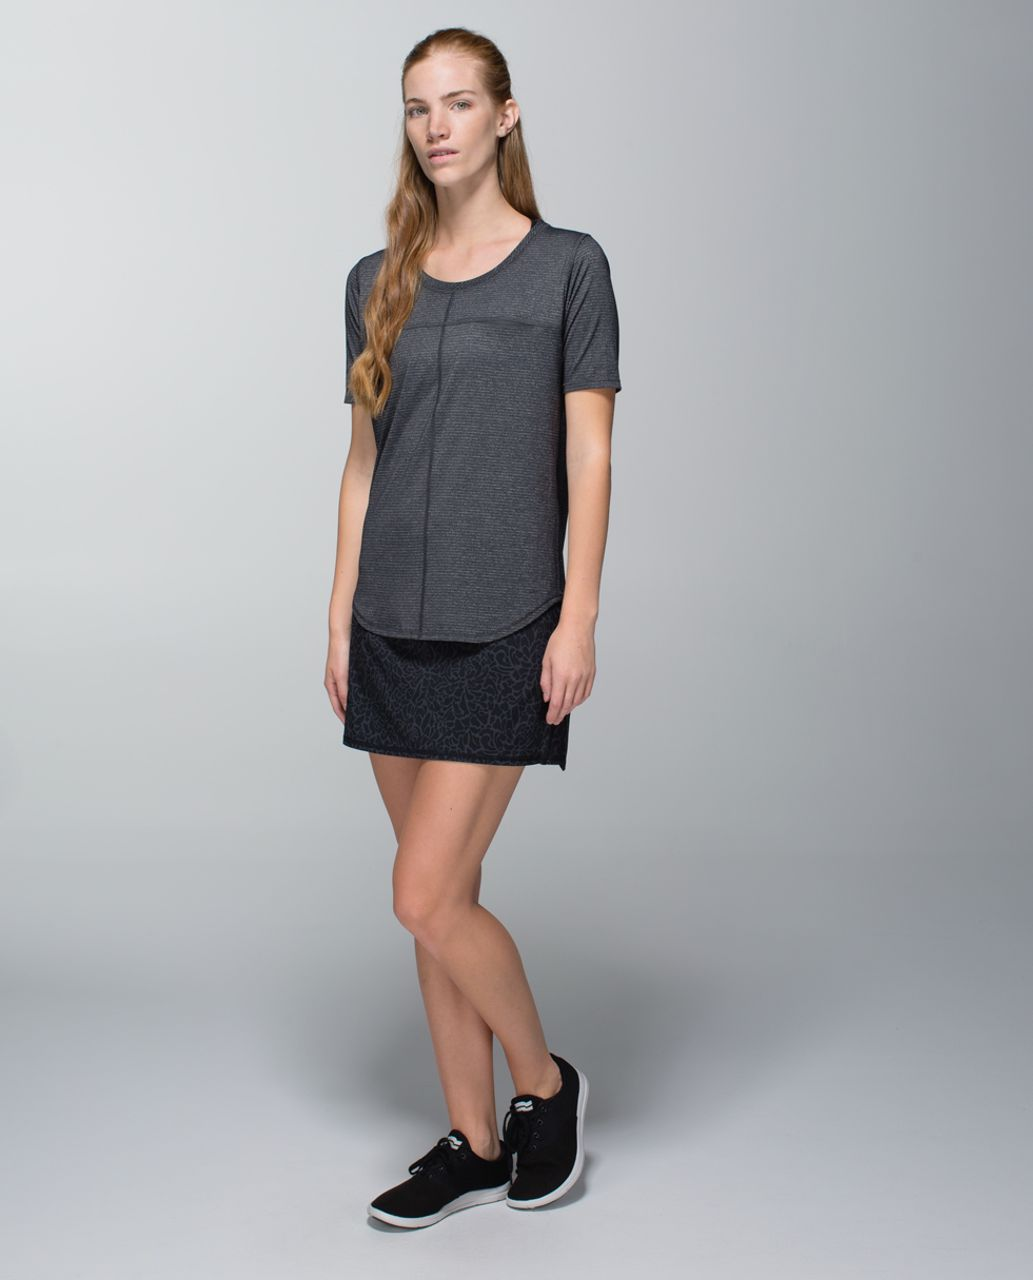 Lululemon Run:  Pace Setter Skirt *4-way Stretch (Tall) - Petal Camo Printed Black Deep Coal / Black